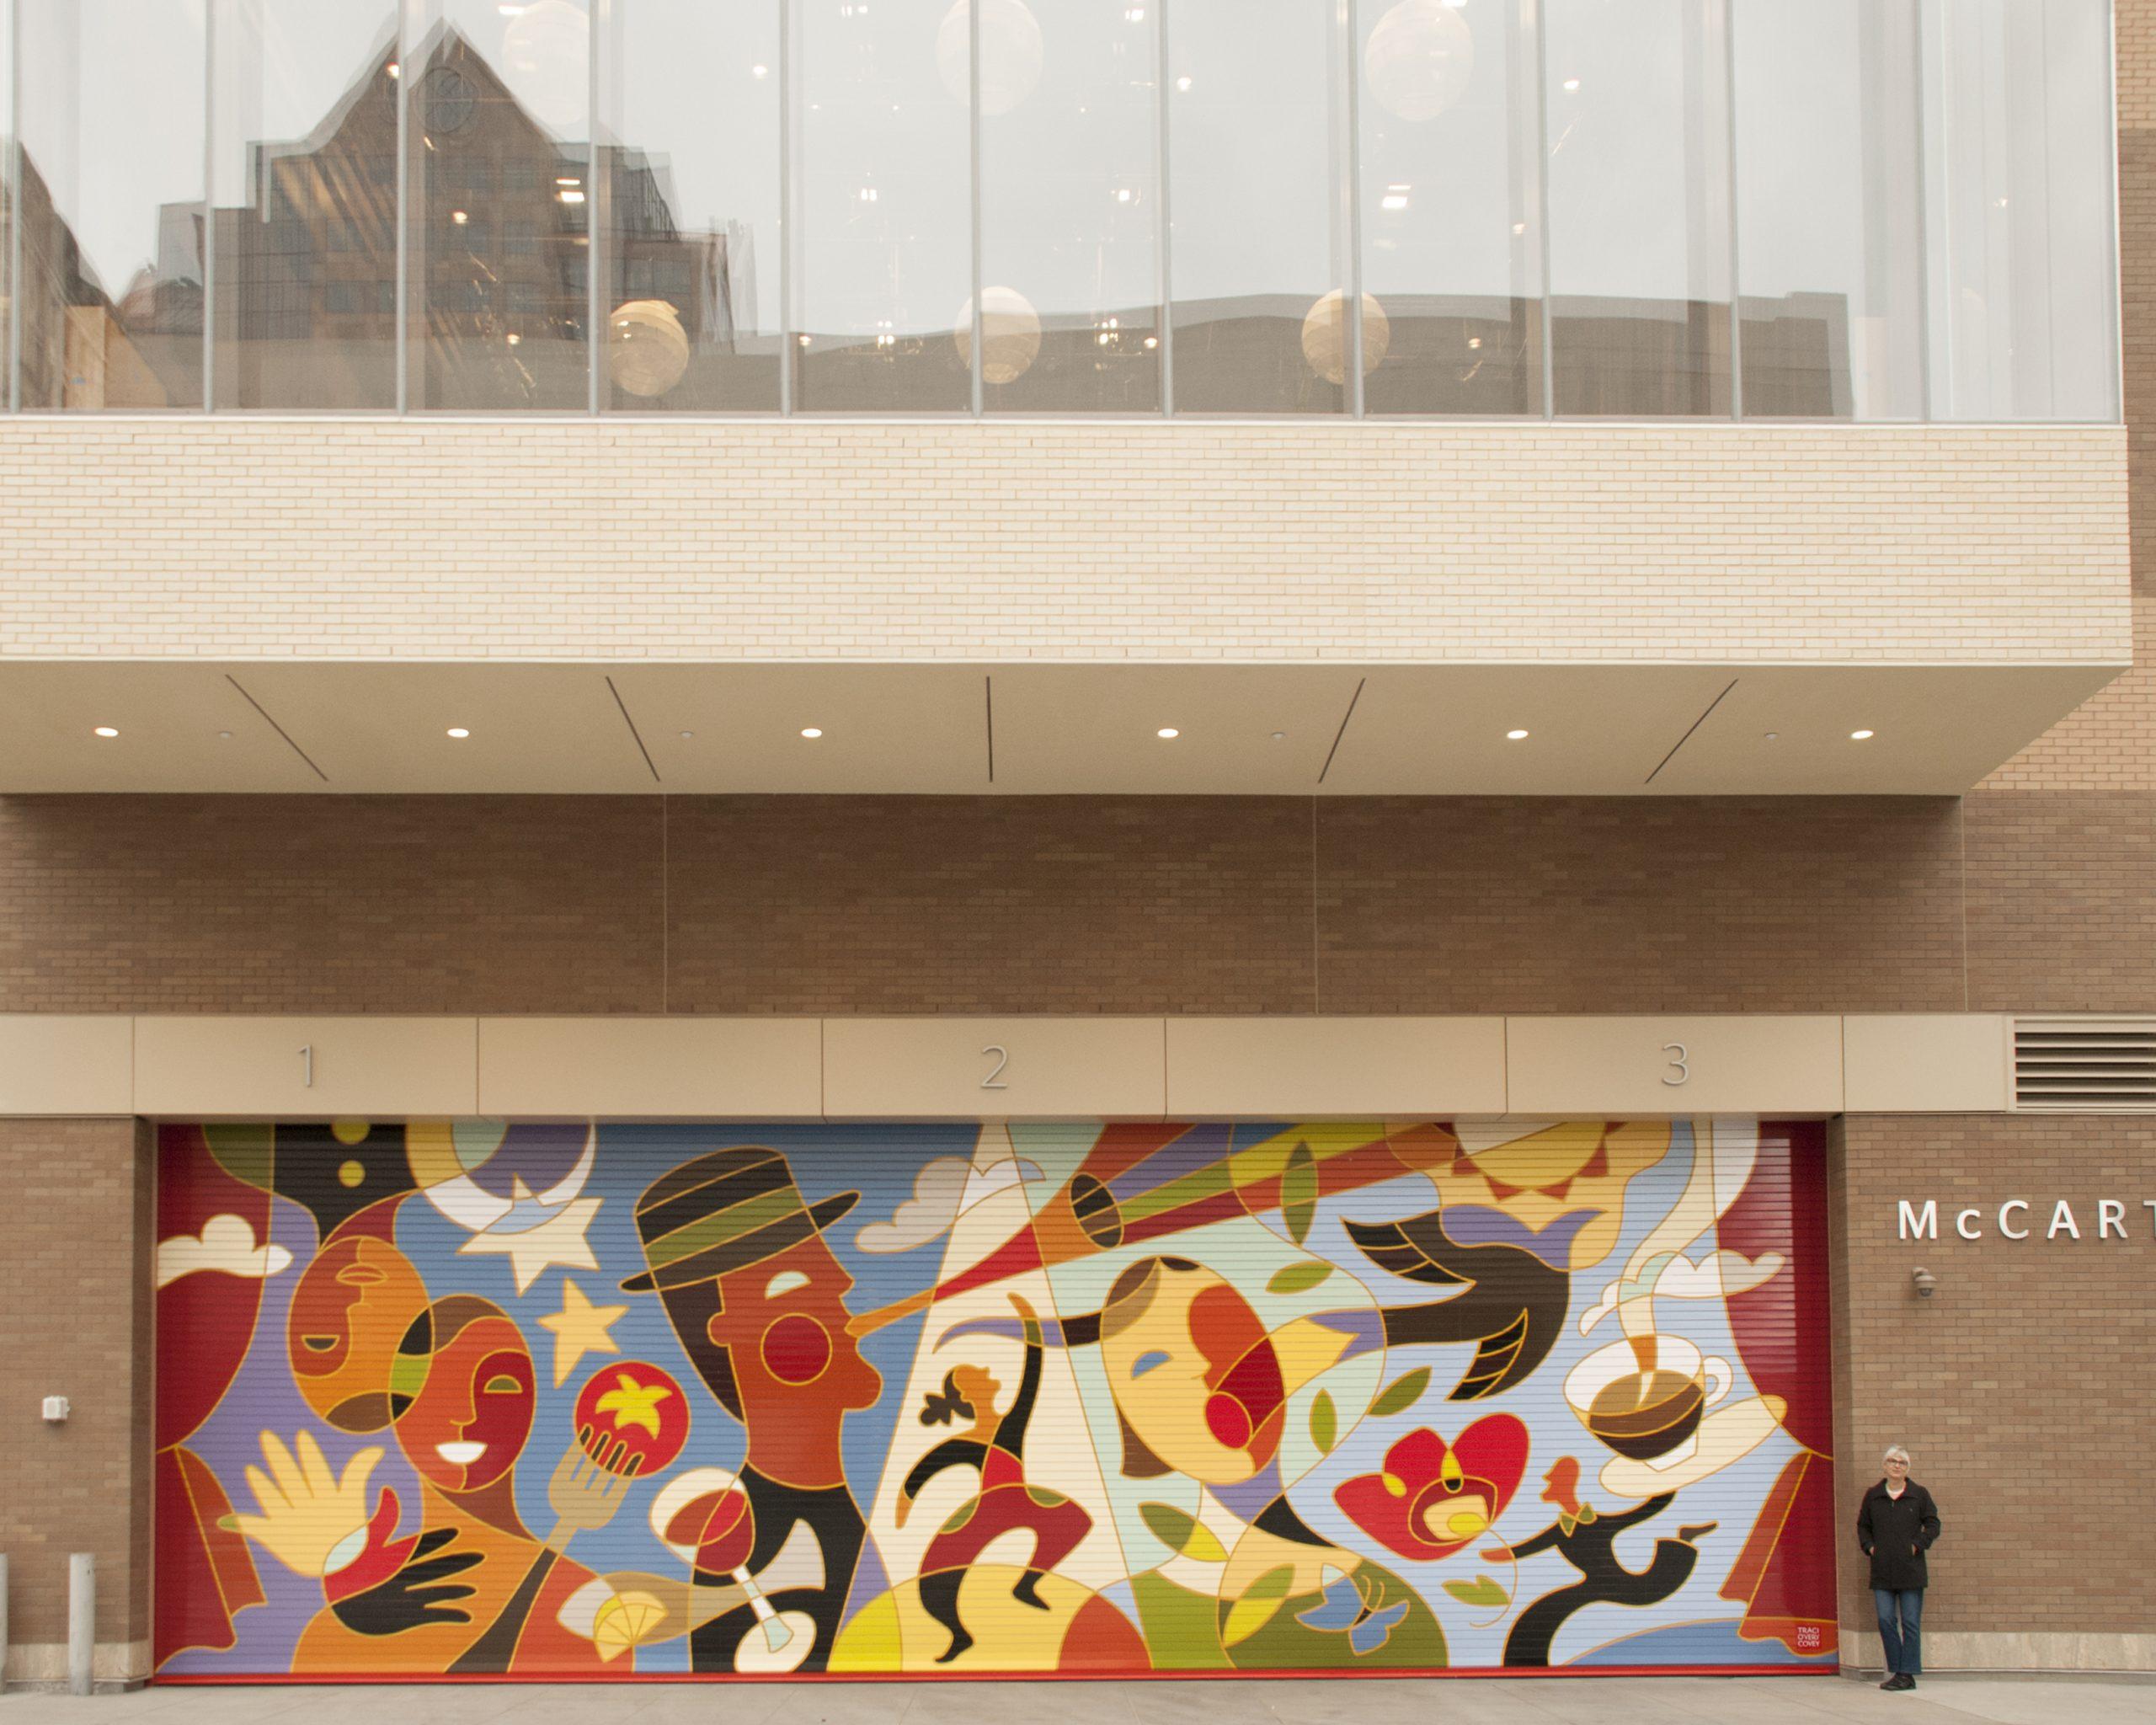 Imagine – Eccles Theater Mural